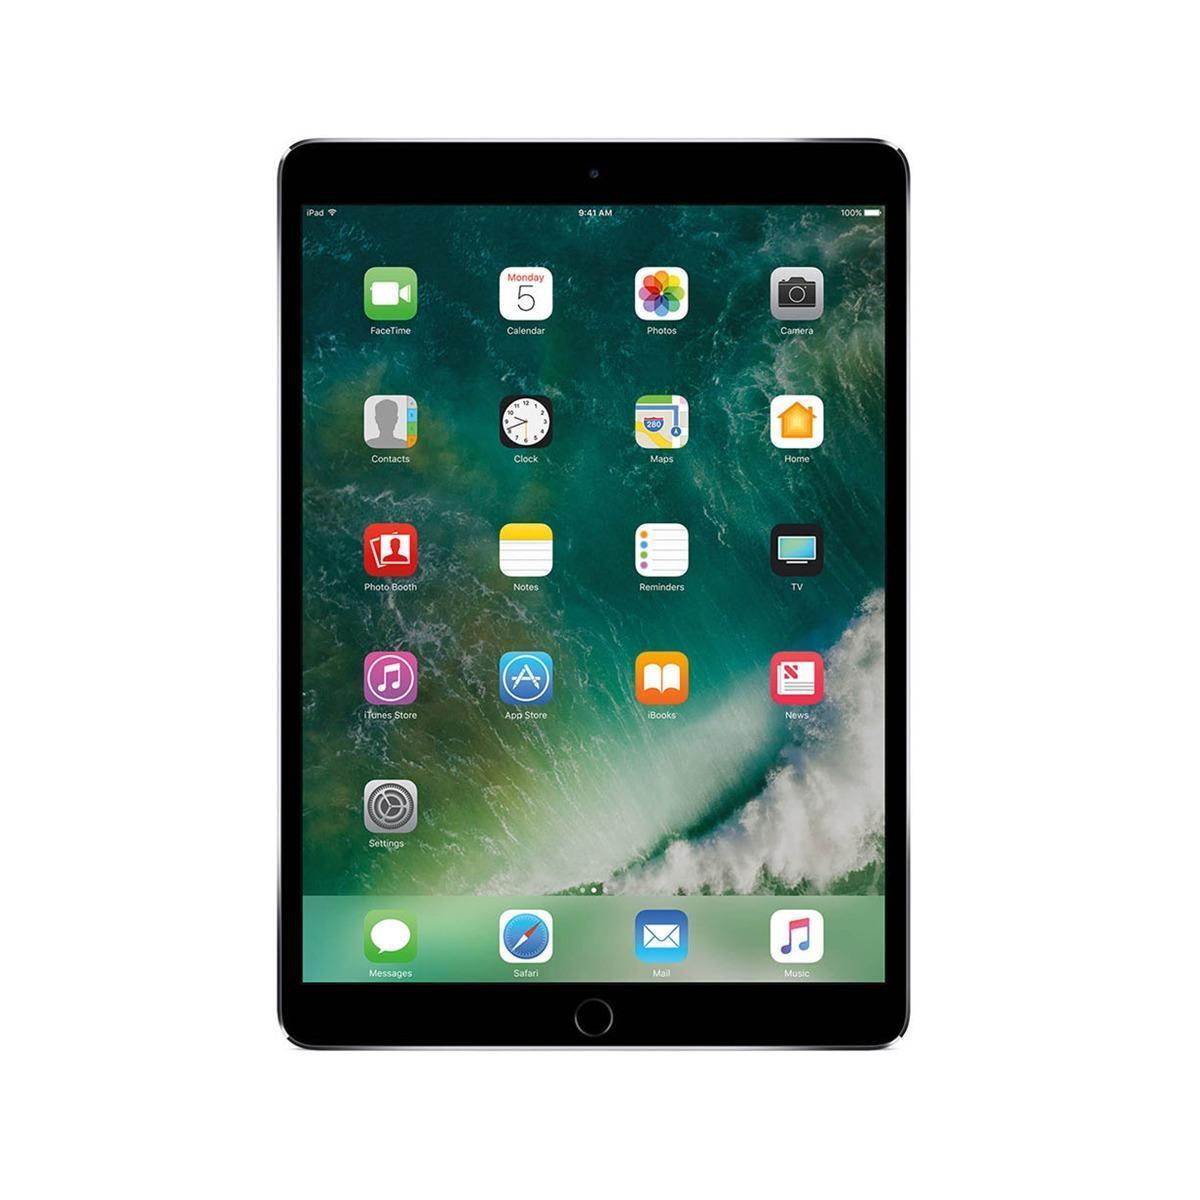 iPad Pro 10.5 64 GB WiFi Zustand Sehr Gut, kombinierbar mit 6% Studentenrabatt, Zustand Gut 342€